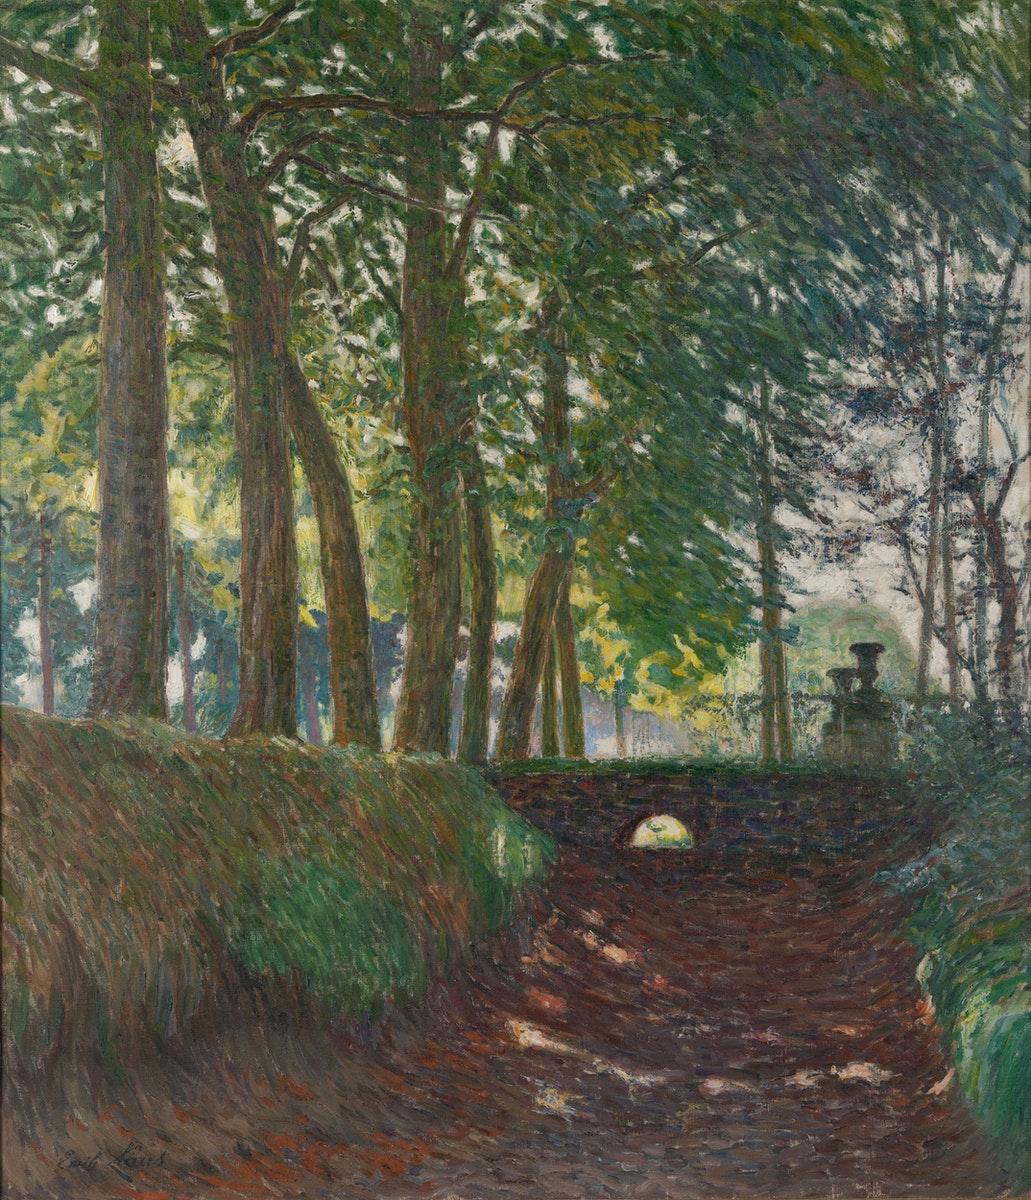 Sint-Martens-Latem, Latemse School, Impressionism, Belgische Kunst, Emile Claus, In The Park September